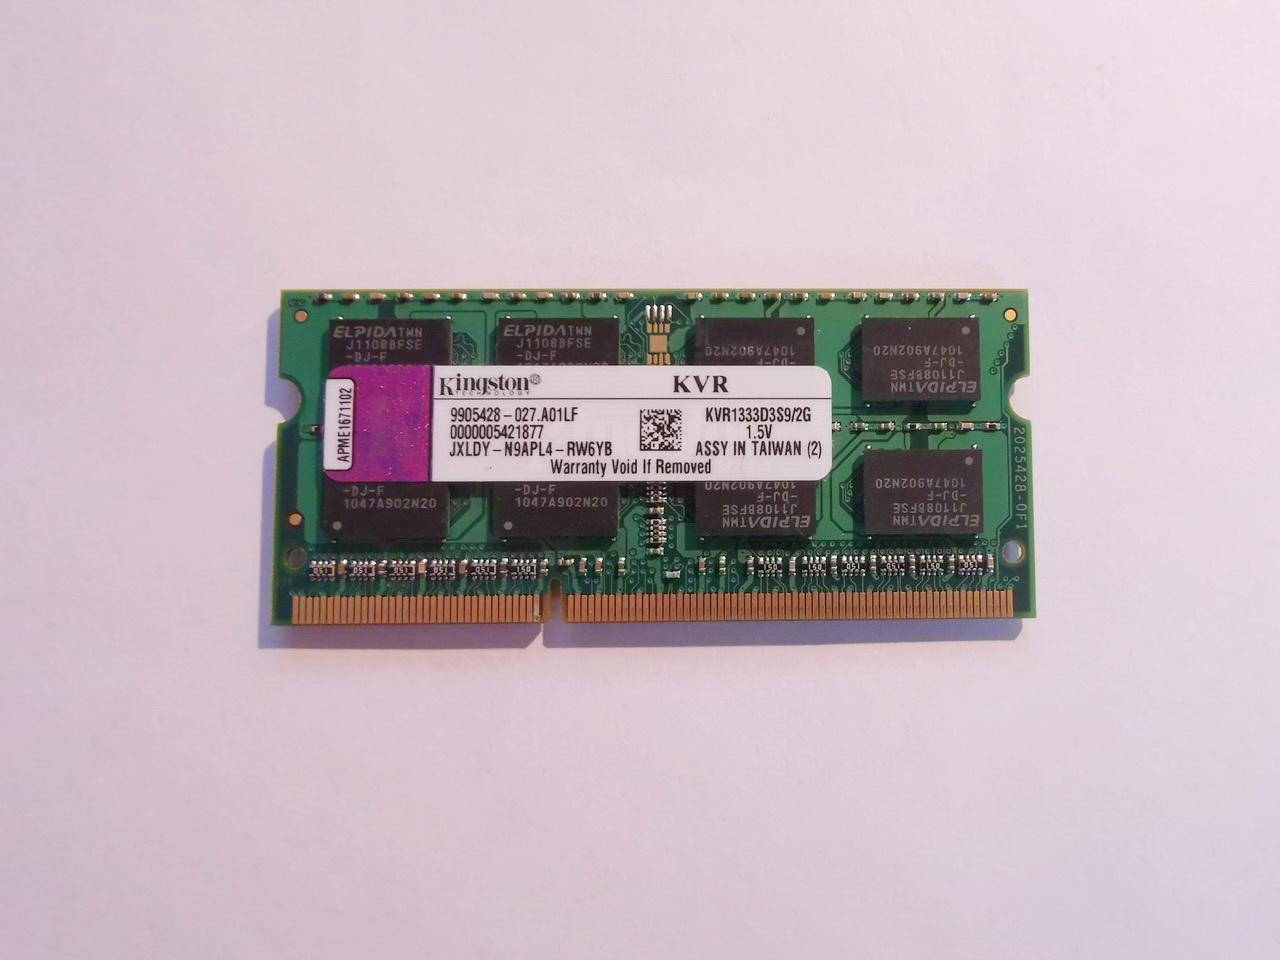 2GB RAM SODIMM DDR3-1333 Kingston paměť pro notebook - foto 1